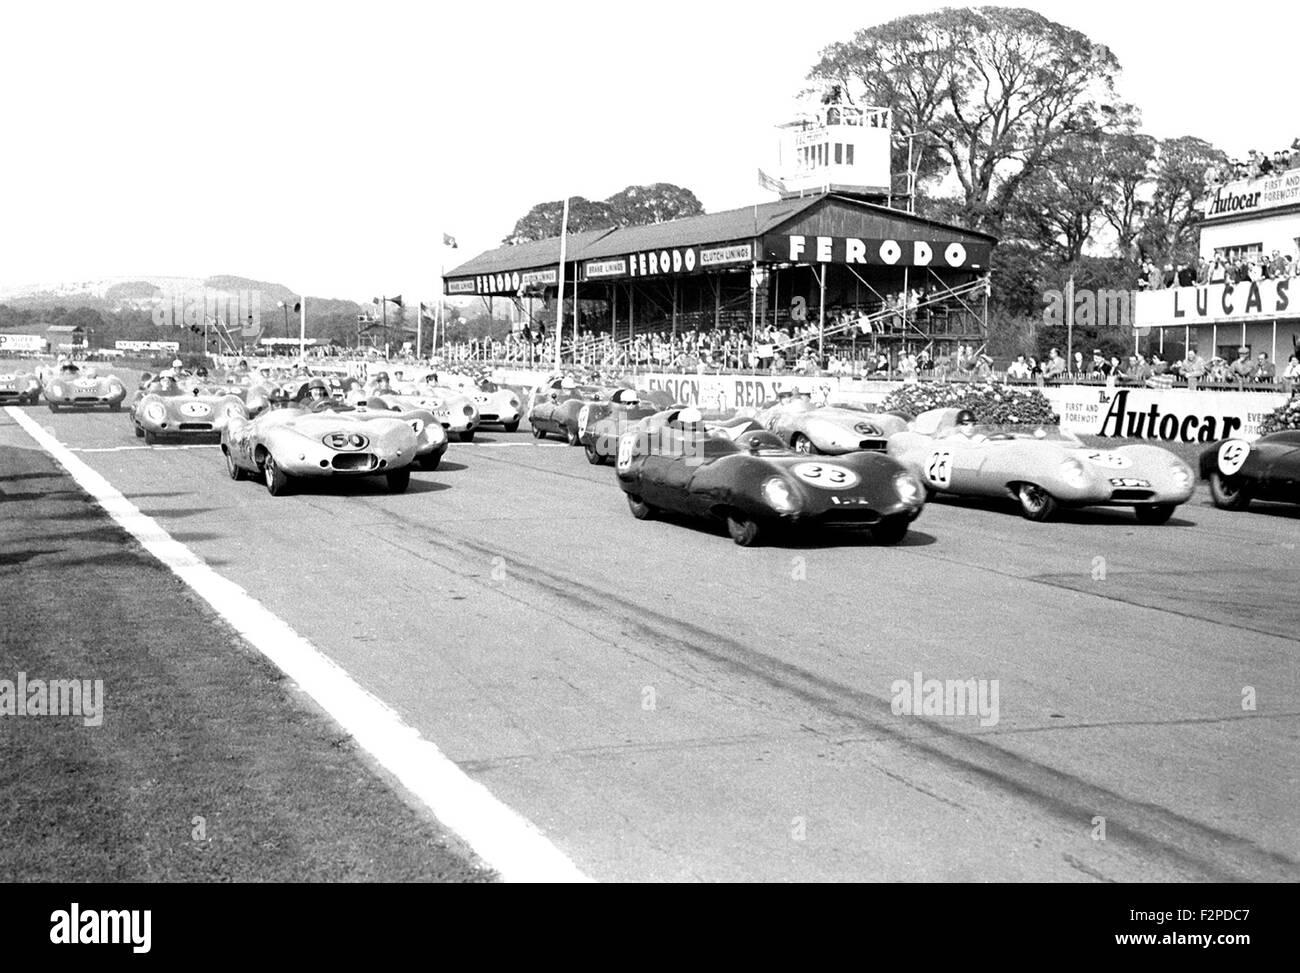 Start des Rennens am Goodwood 1957 Stockbild